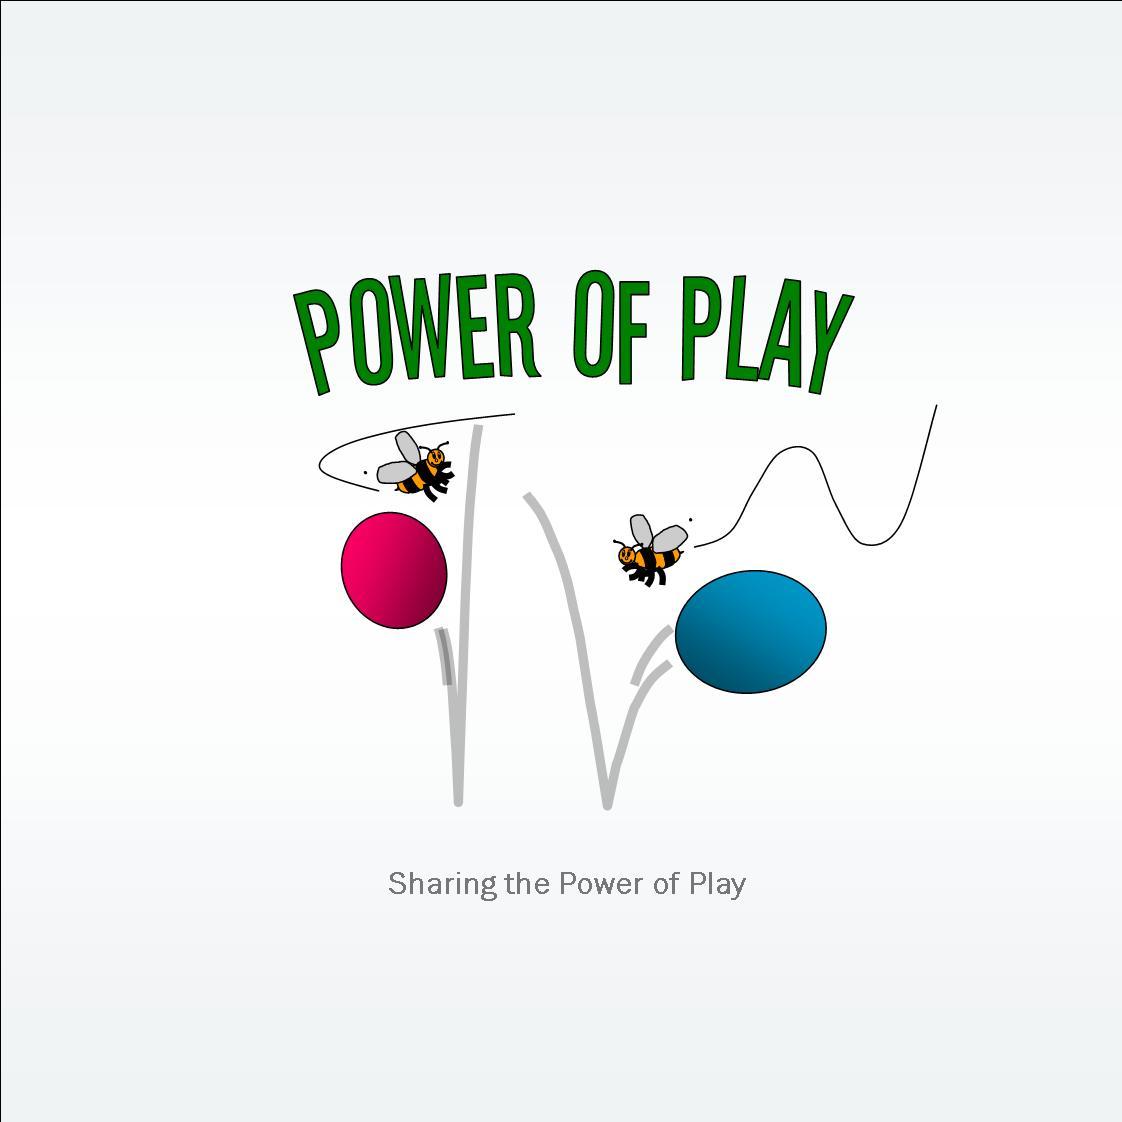 Logo Design by nk - Entry No. 48 in the Logo Design Contest Power Of Play Logo Design.